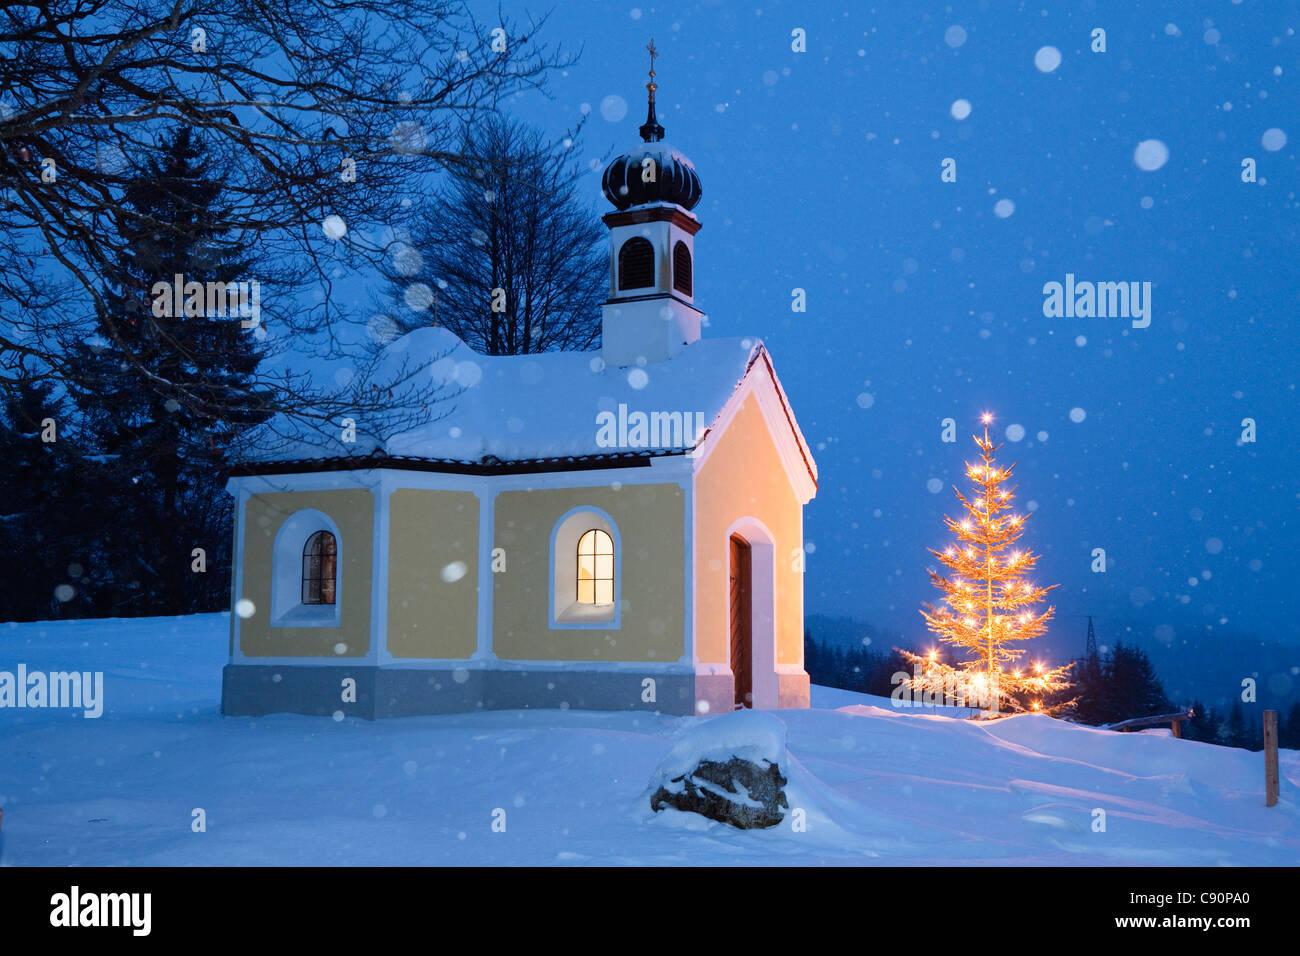 chapel with christmas tree at snowfall, Upper Bavaria, Germany, Europe - Stock Image